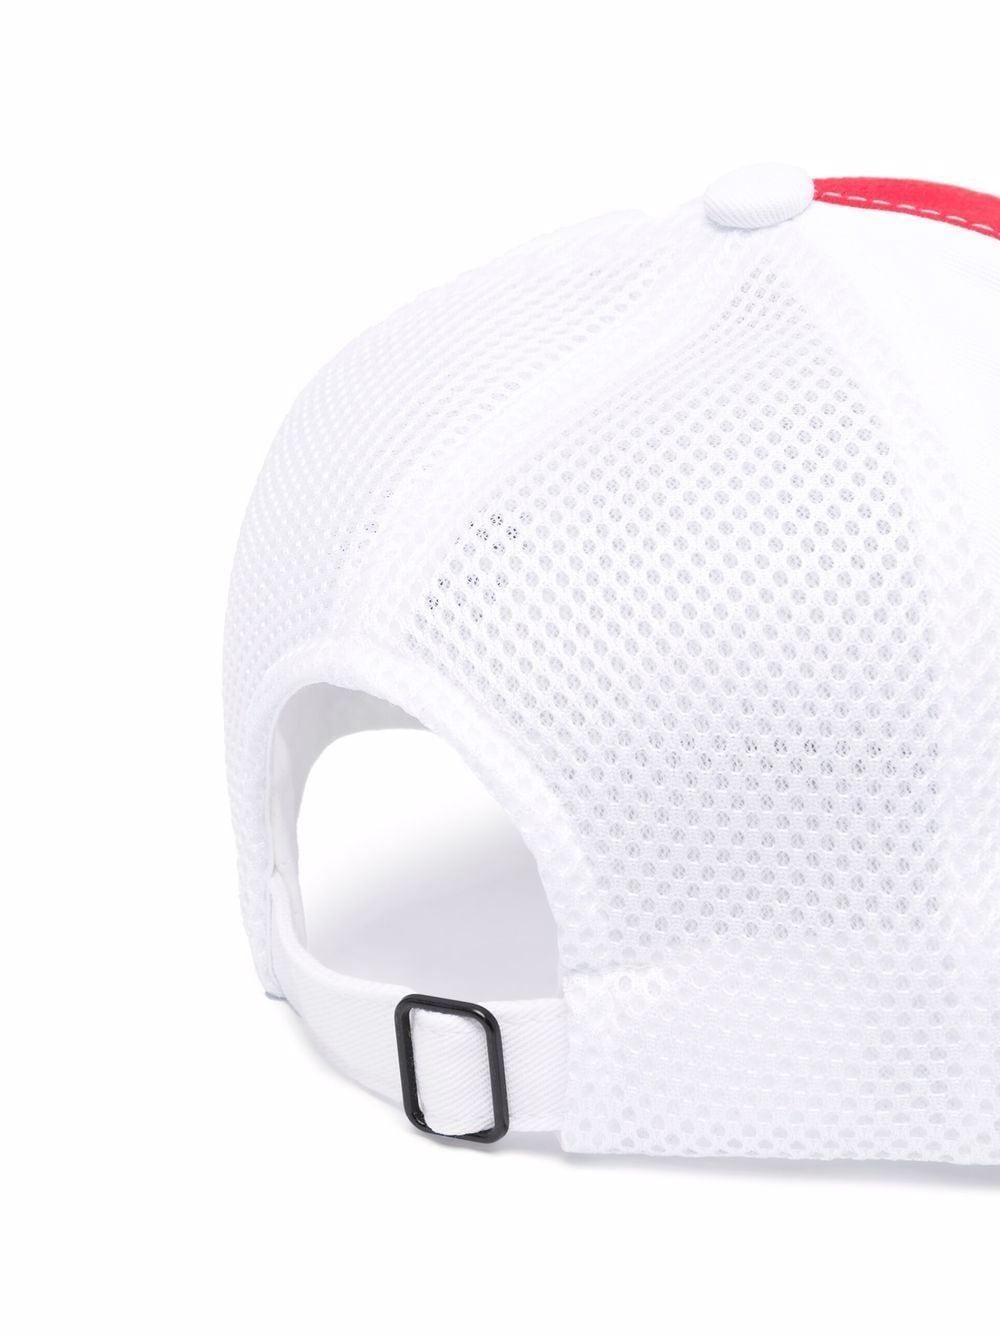 100s japan twill cap man white in cotton CASABLANCA | Hats | AF21-HAT-012CASABLANCA 100'S JAPAN